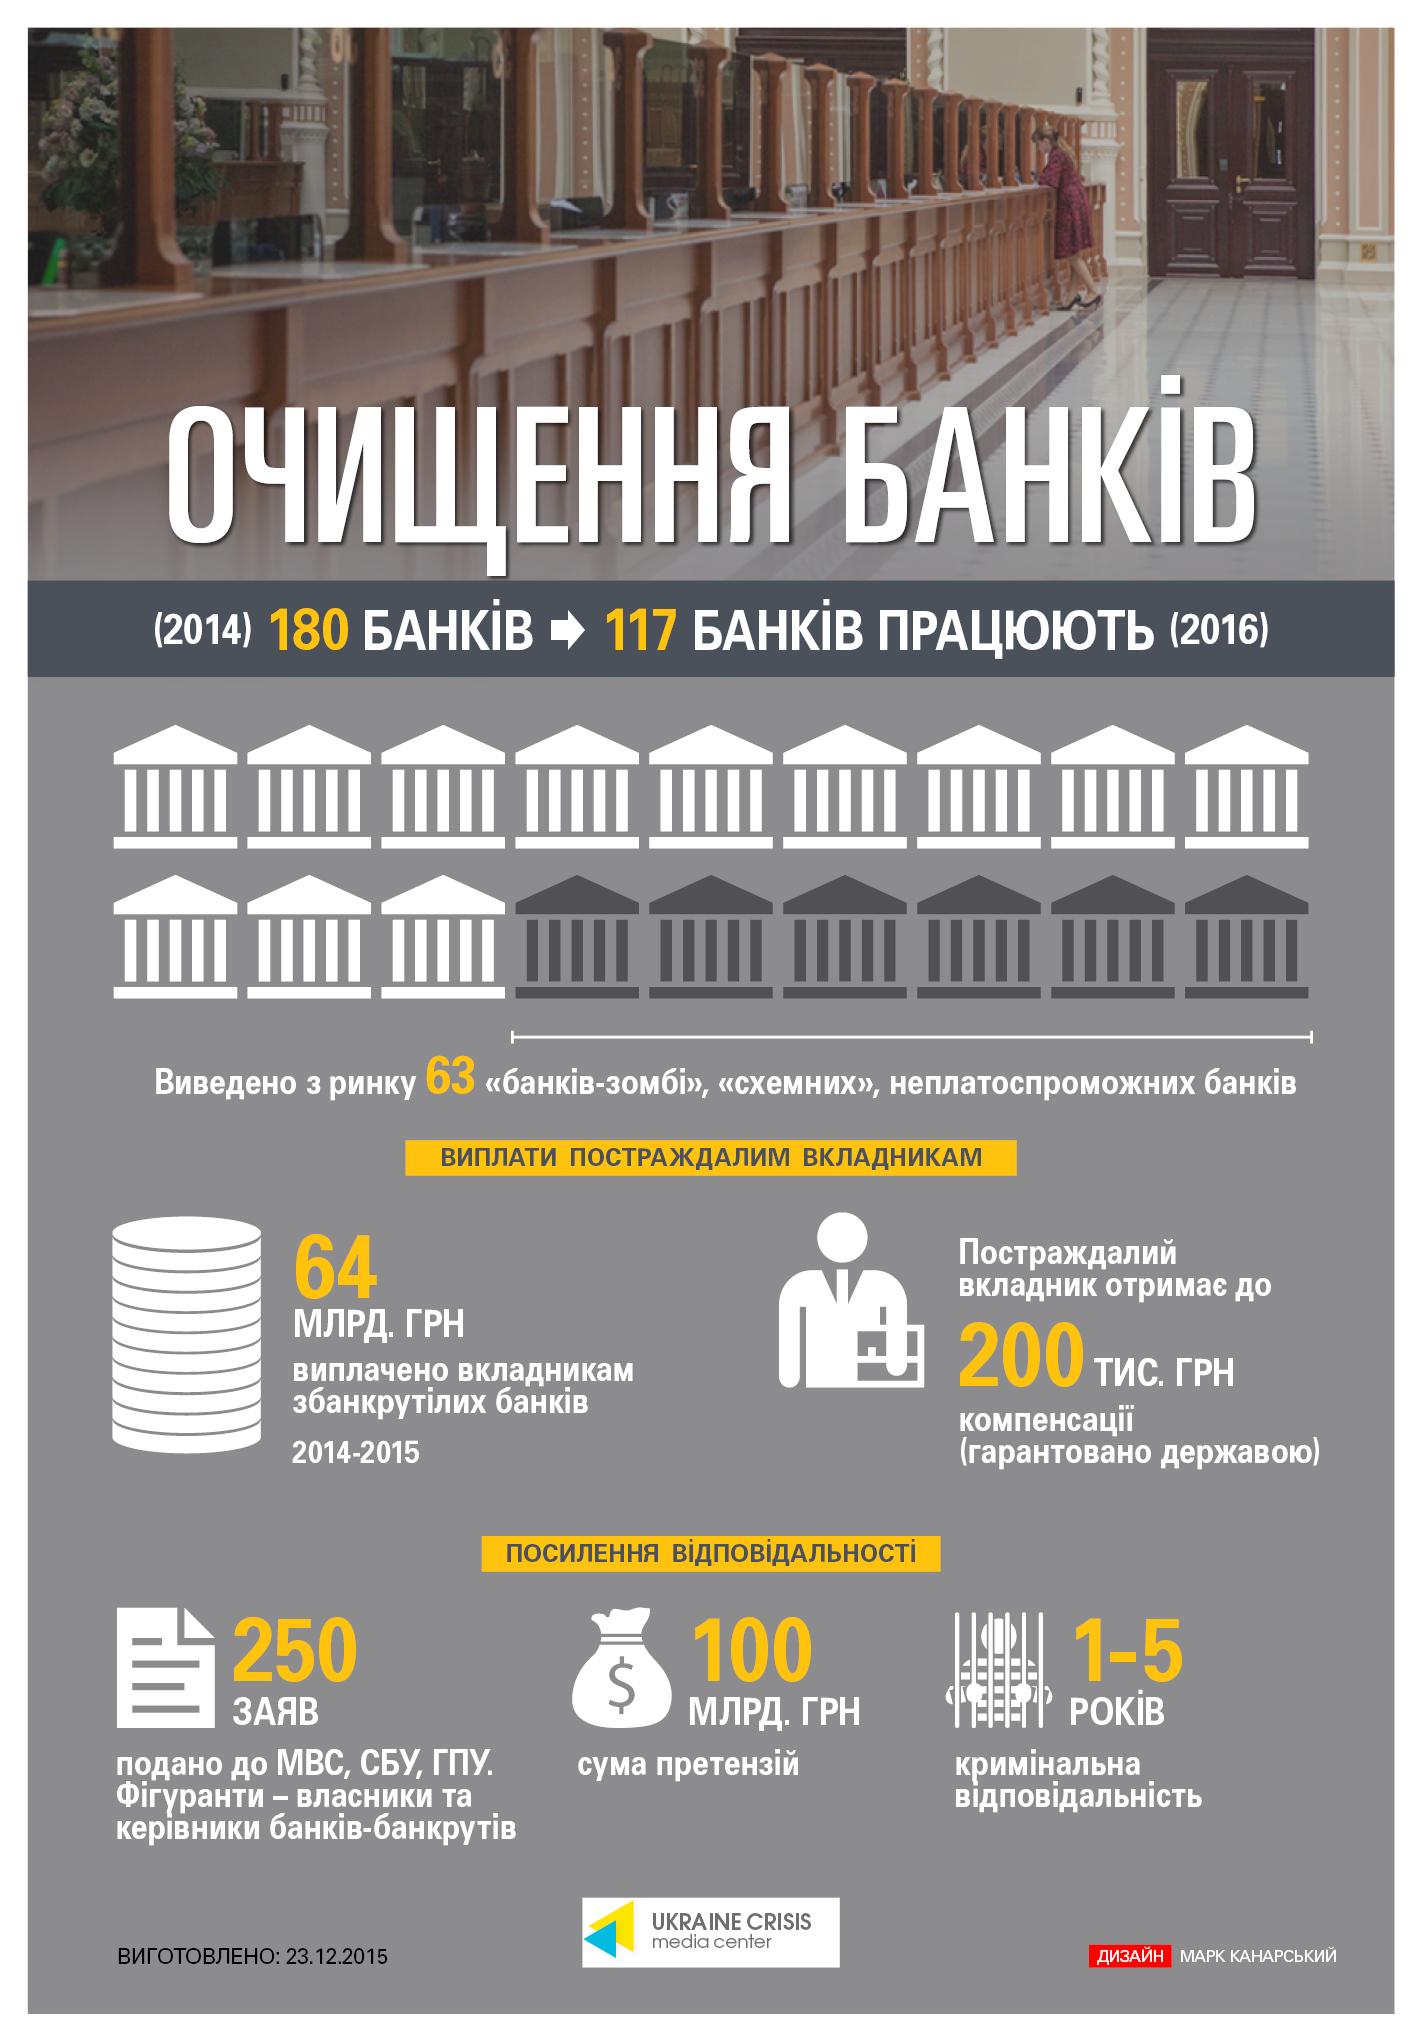 bank-ukr-07